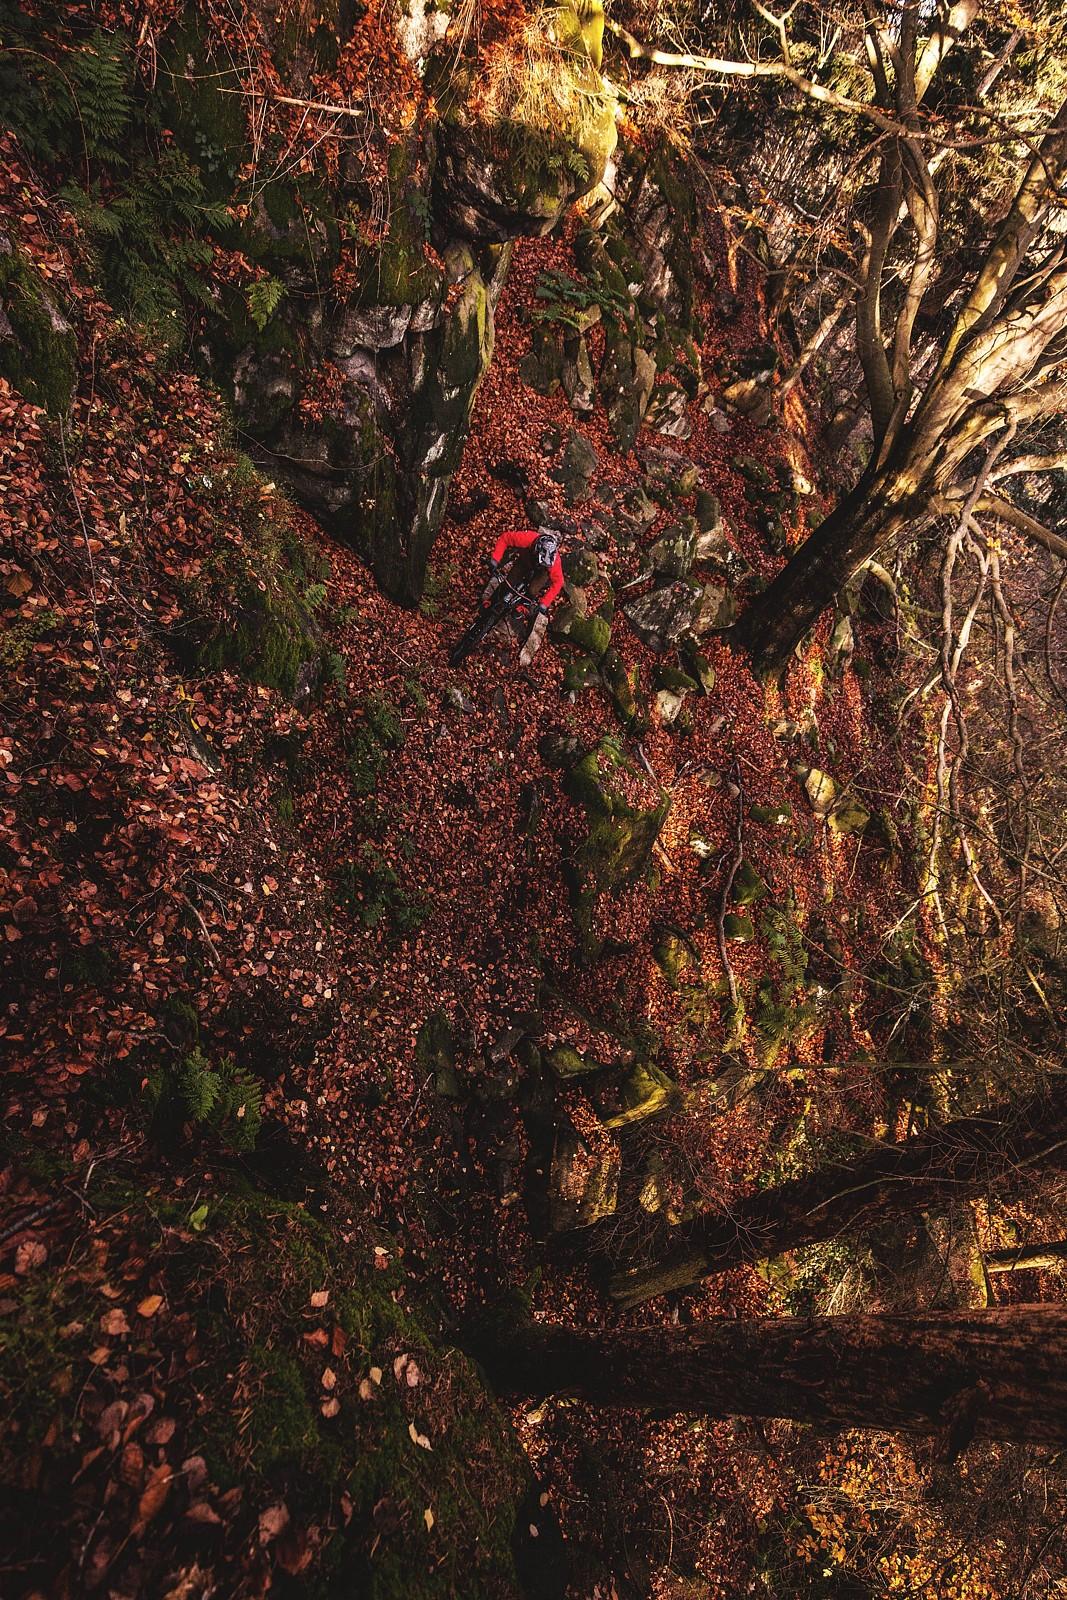 Autumn trail riding - Mad Moss - Mountain Biking Pictures - Vital MTB